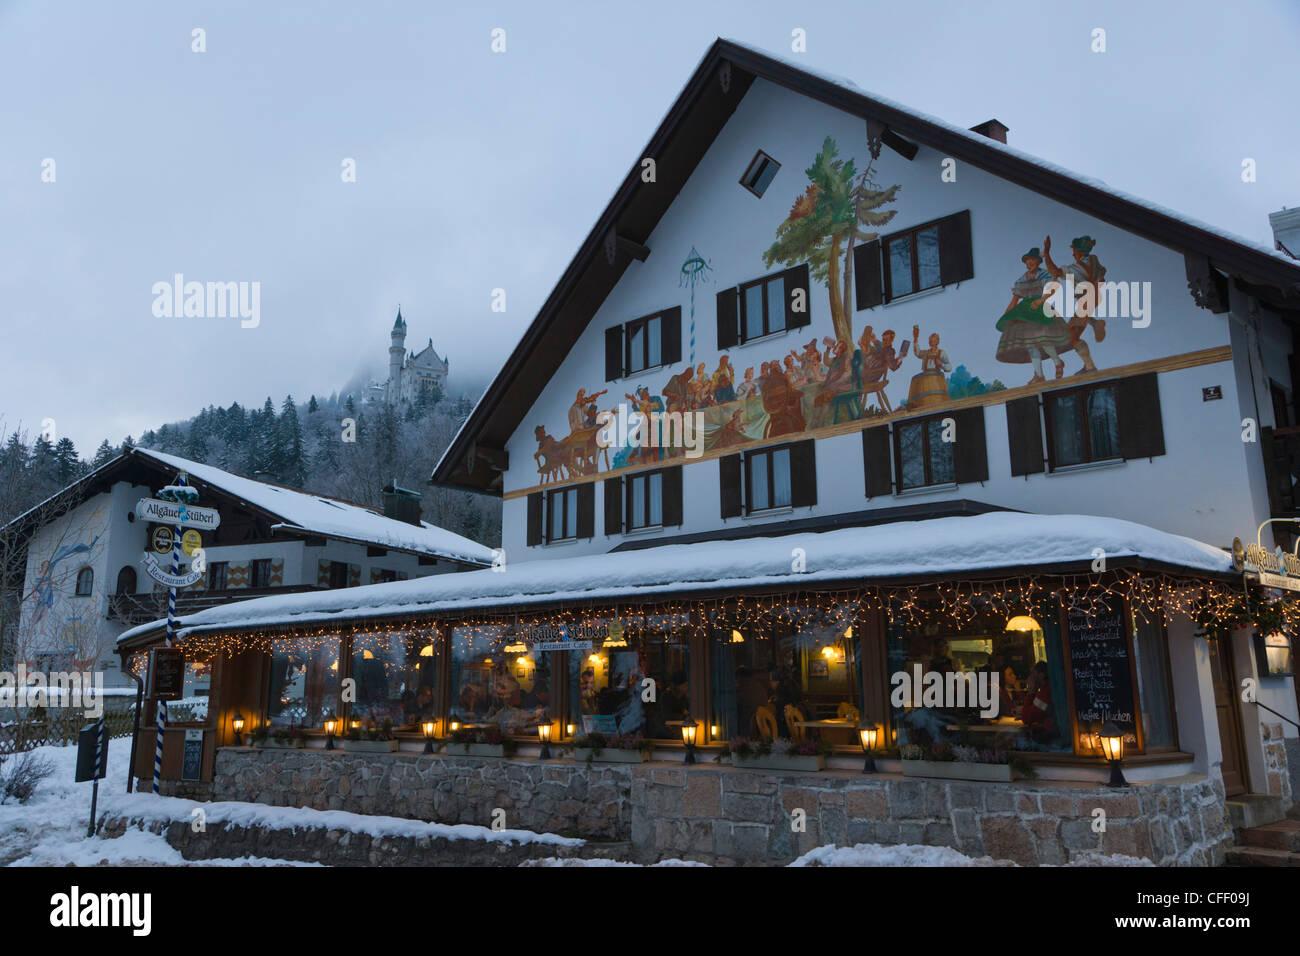 Allgauer Stuberl cafe, Alpseestrasse, Hohenschwangau village, Schwangau, Ostallgau, Bavaria, Germany, Winter Stock Photo